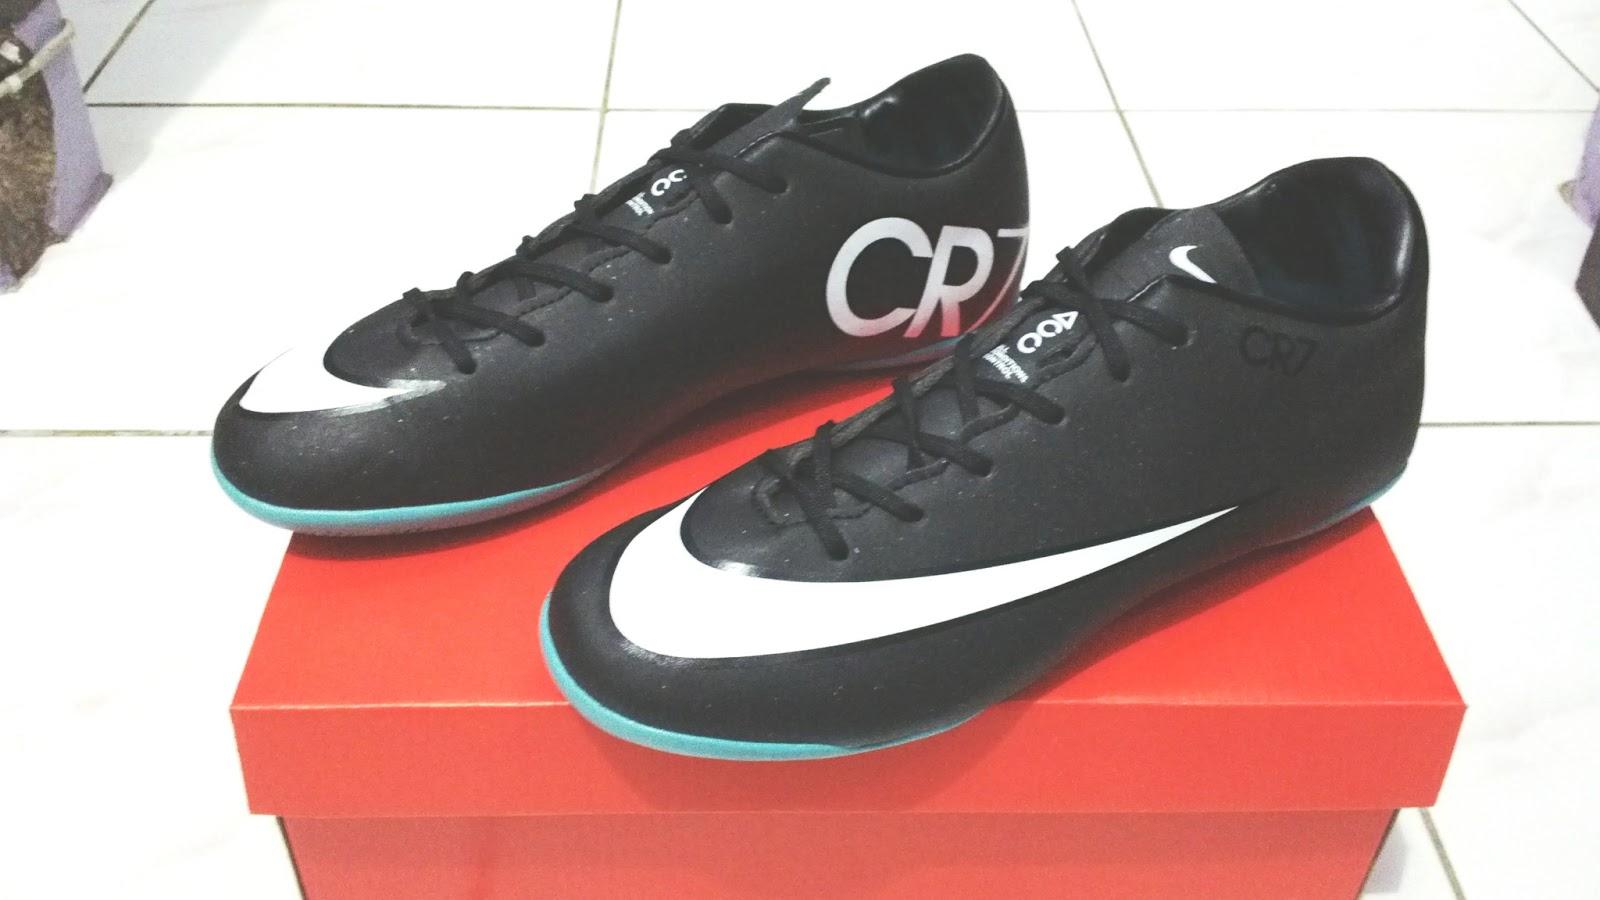 ... cheapest model sepatu bola nike terbaru 2015 image. model 2. cf67f  6ec1b ... 8f30fb7610